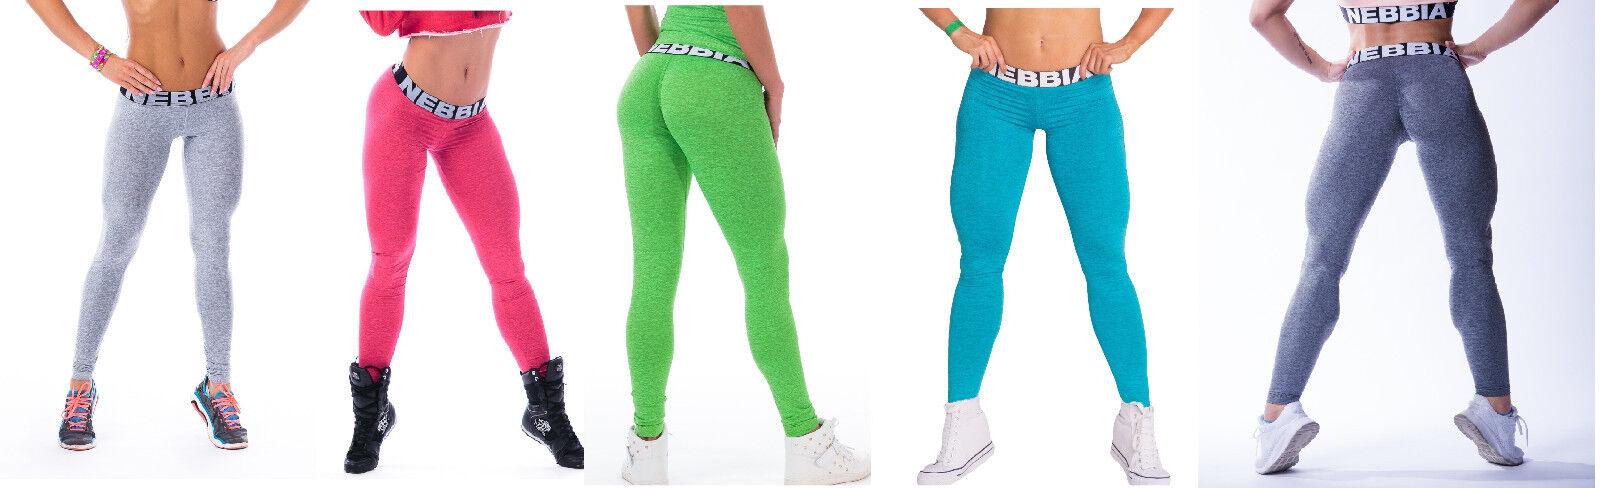 Nebbia Scrunch Butt Leggings 222   cheap in high quality